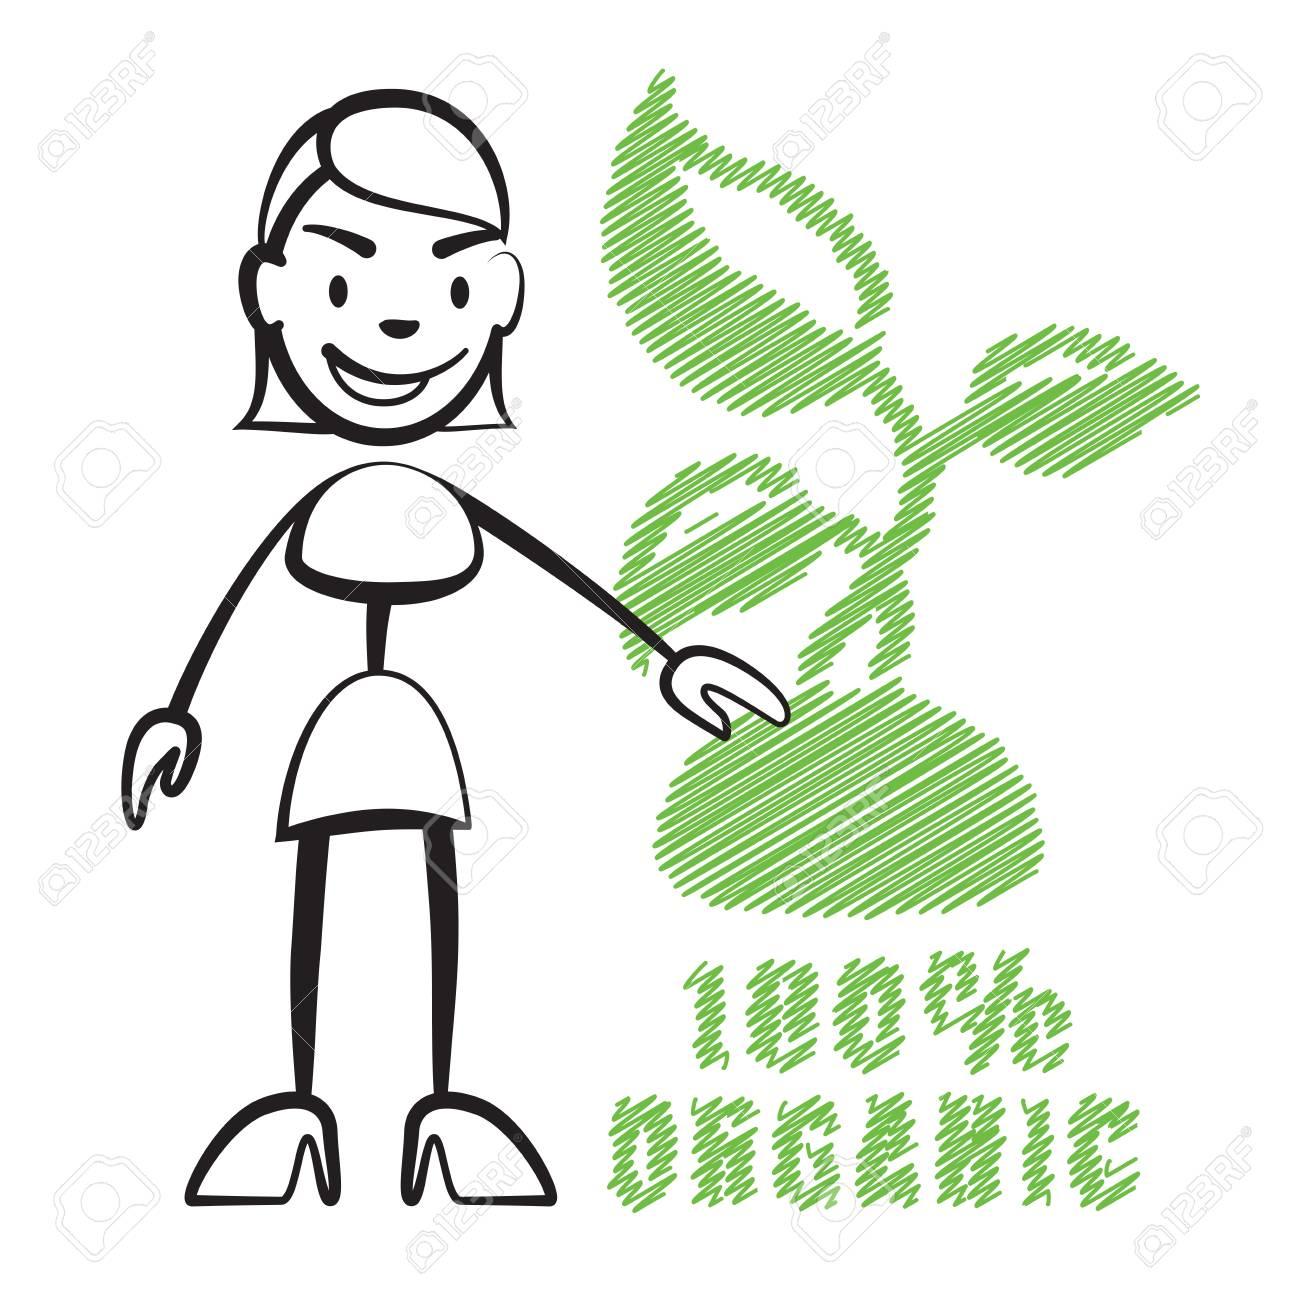 Strichmännchen Frau Mit Dem Symbol 100 Organic Stickman Vektor